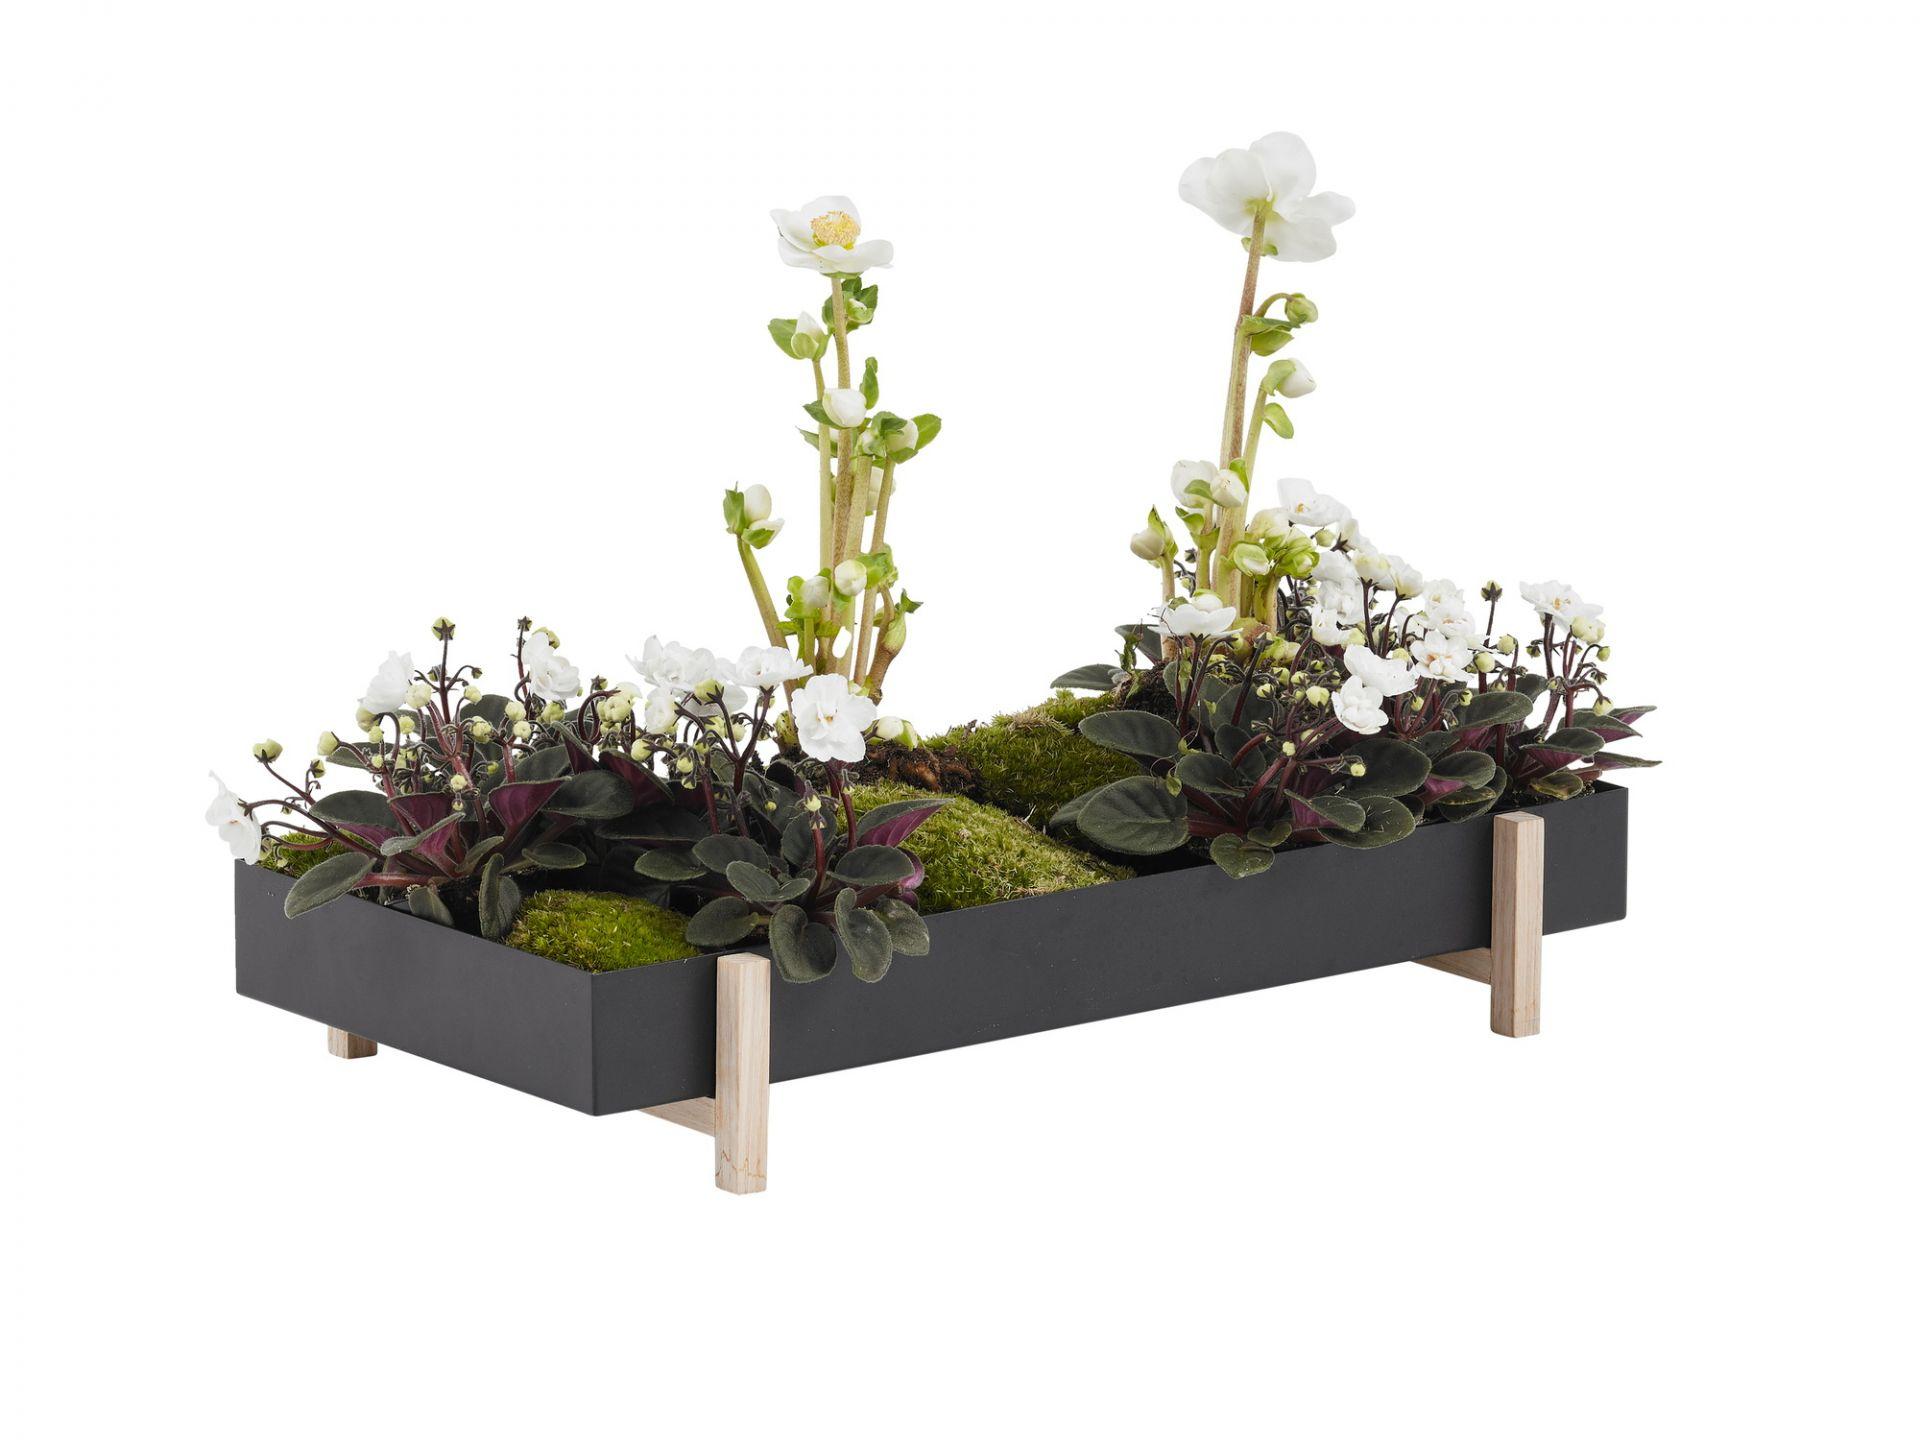 Botanic Tray Blumenkasten Design House Stockholm